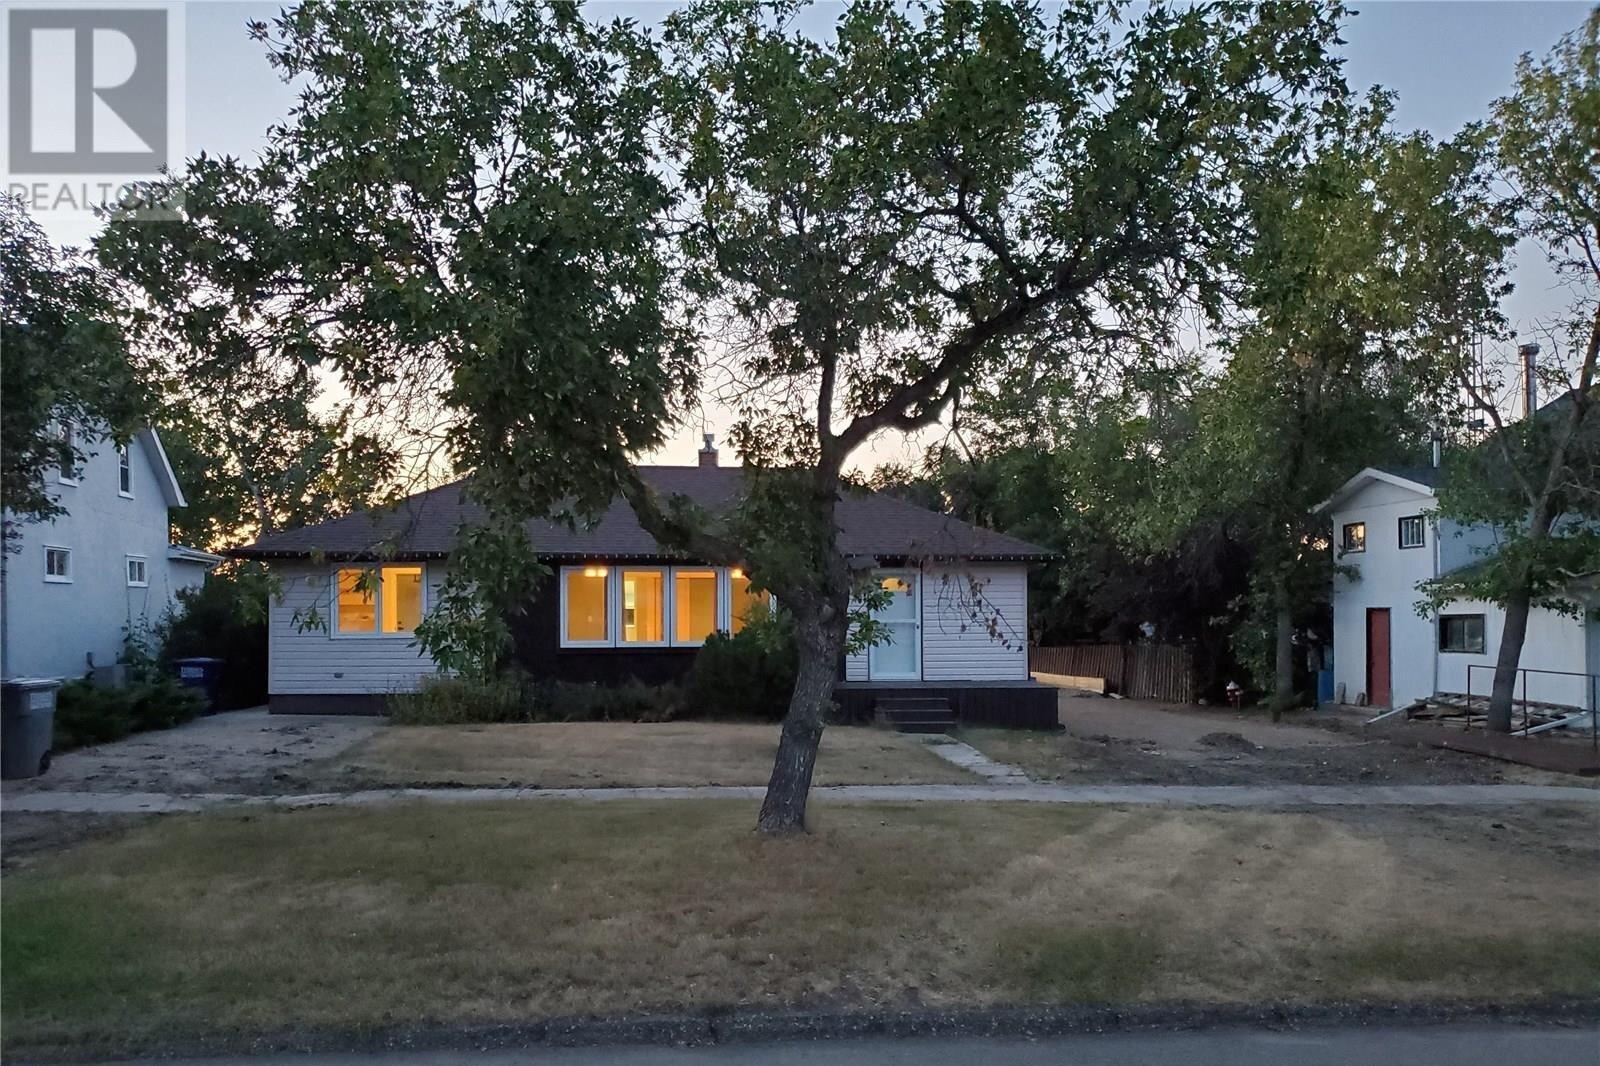 House for sale at 403 Centre St Cabri Saskatchewan - MLS: SK824095